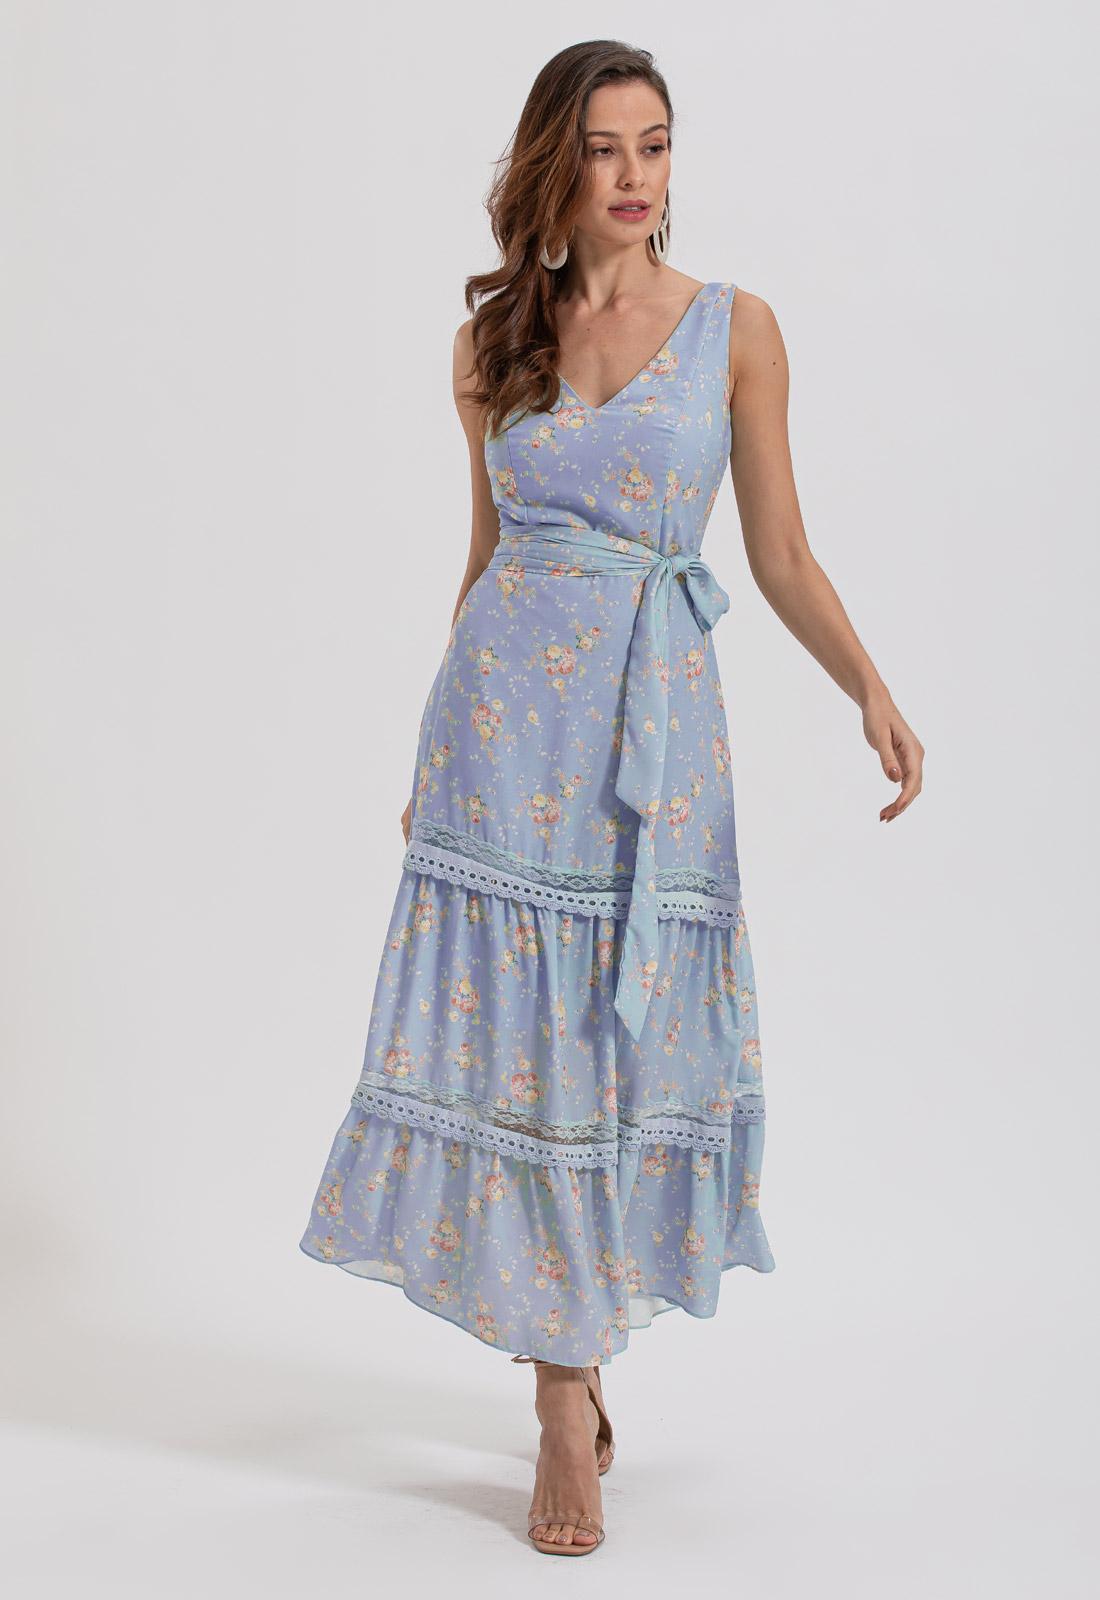 Vestido estampado midi azul Ref. 2640